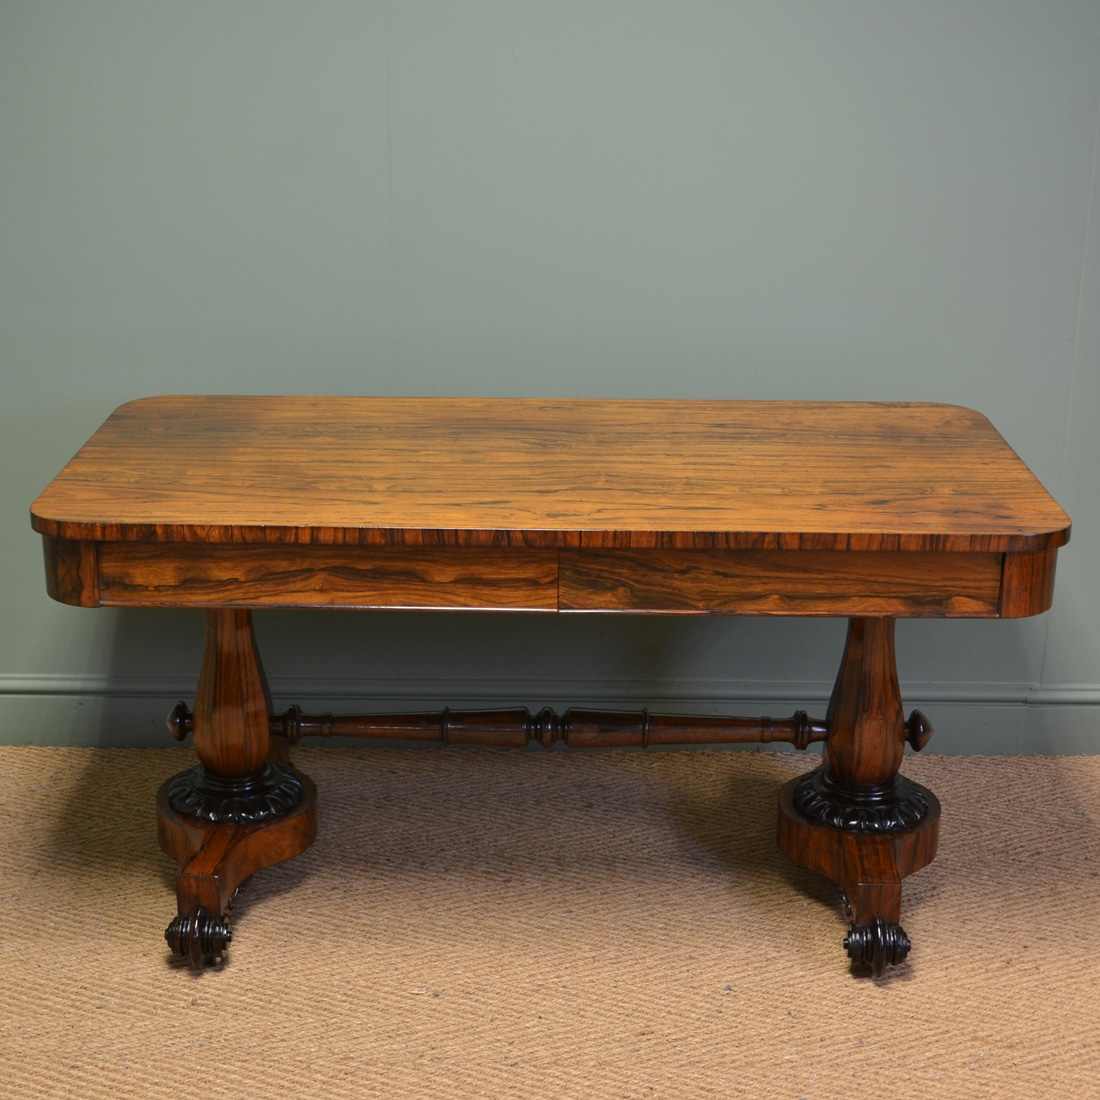 Spectacular Regency Rosewood Antique Partners Writing Table / Desk - Spectacular Regency Rosewood Antique Partners Writing Table / Desk